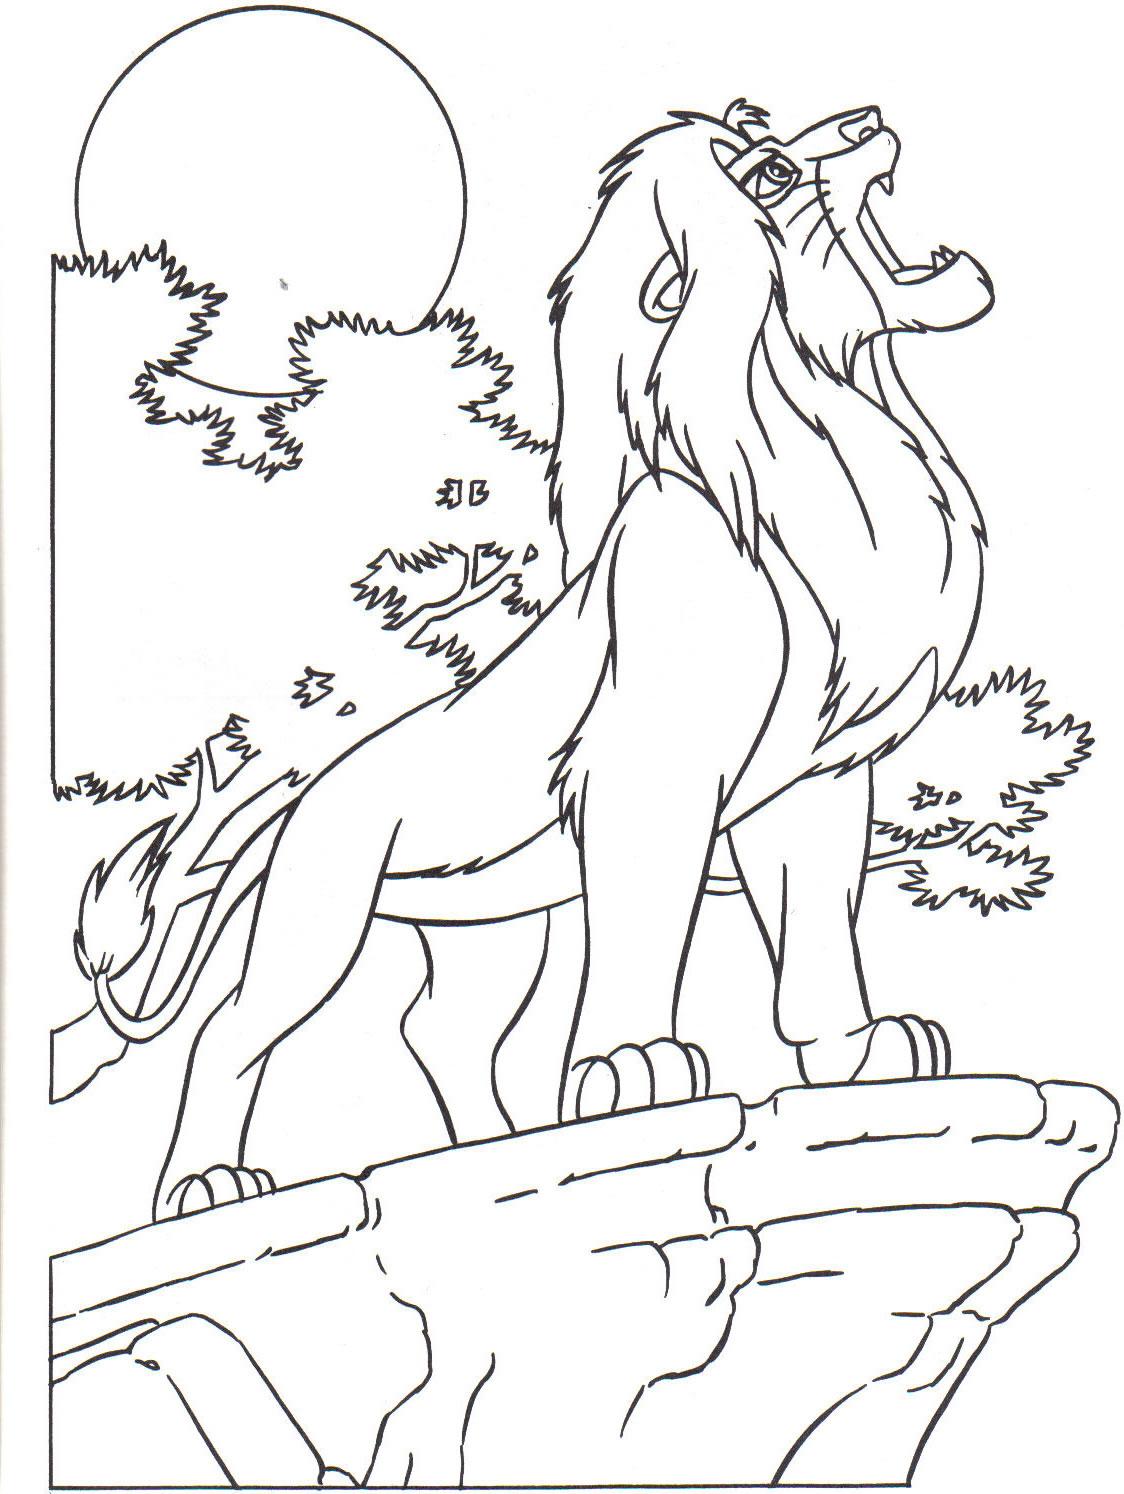 Le Roi Lion 4 Coloriage Le Roi Lion Coloriages Pour Enfants